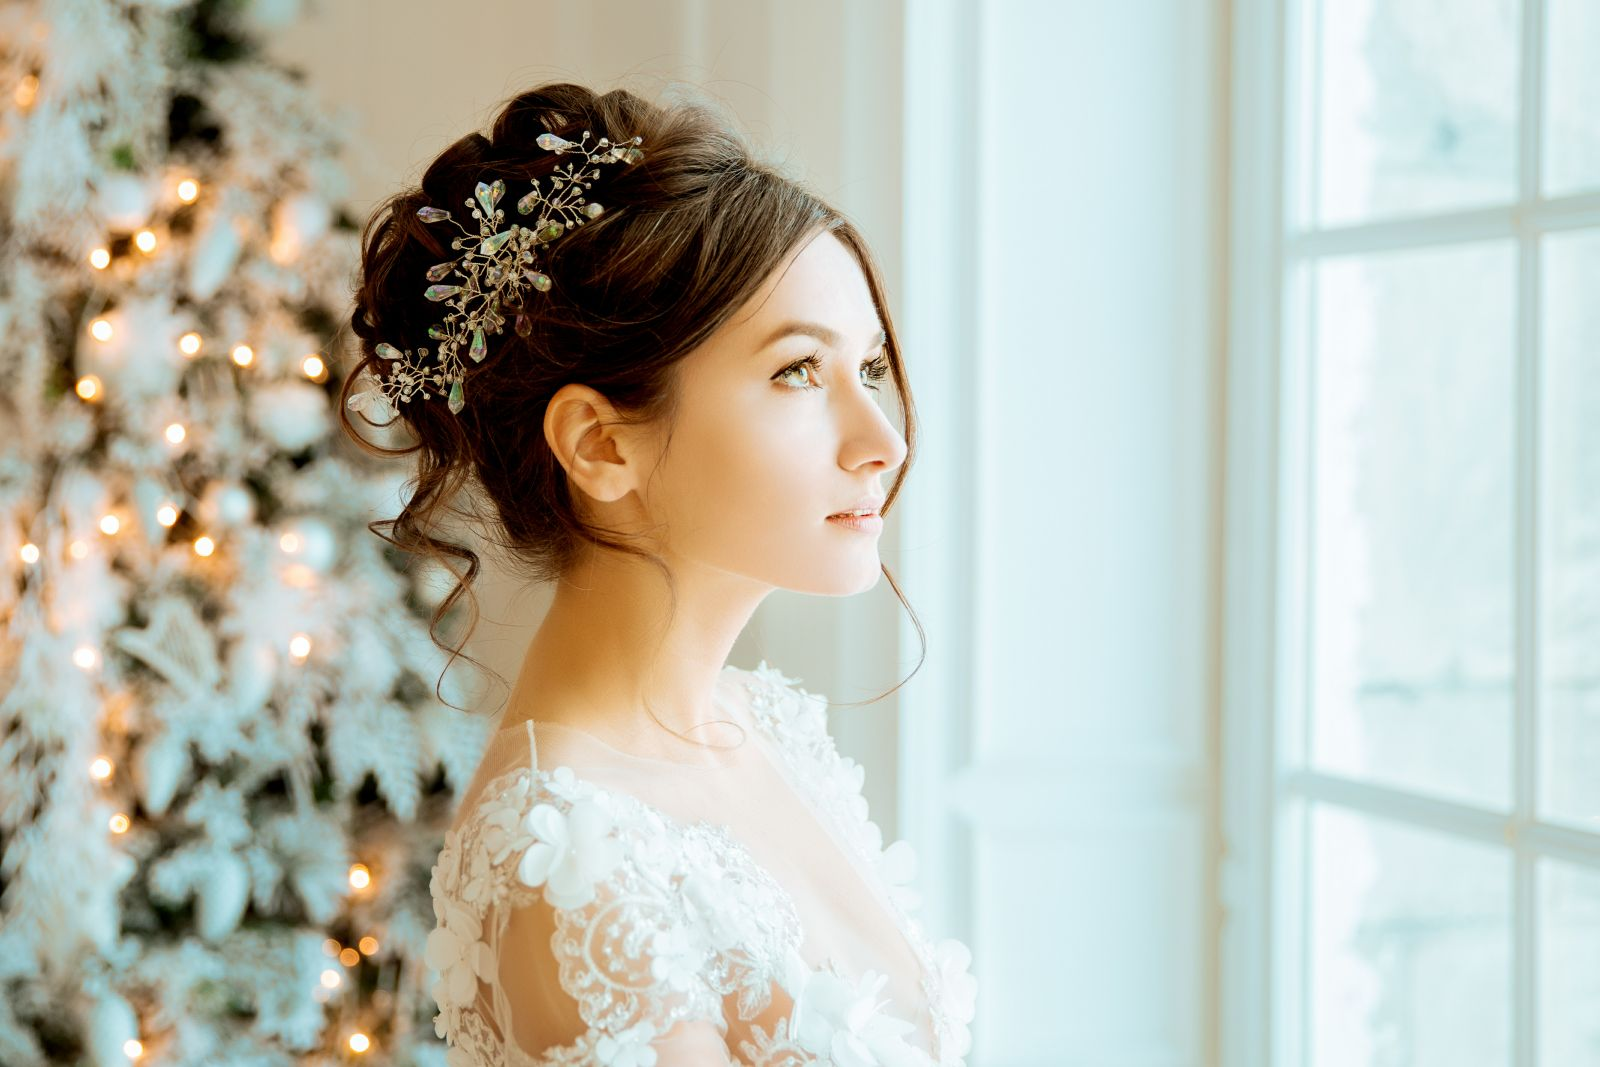 gatehouse-brides-wedding-dresses-worcestershire - Gatehouse Brides